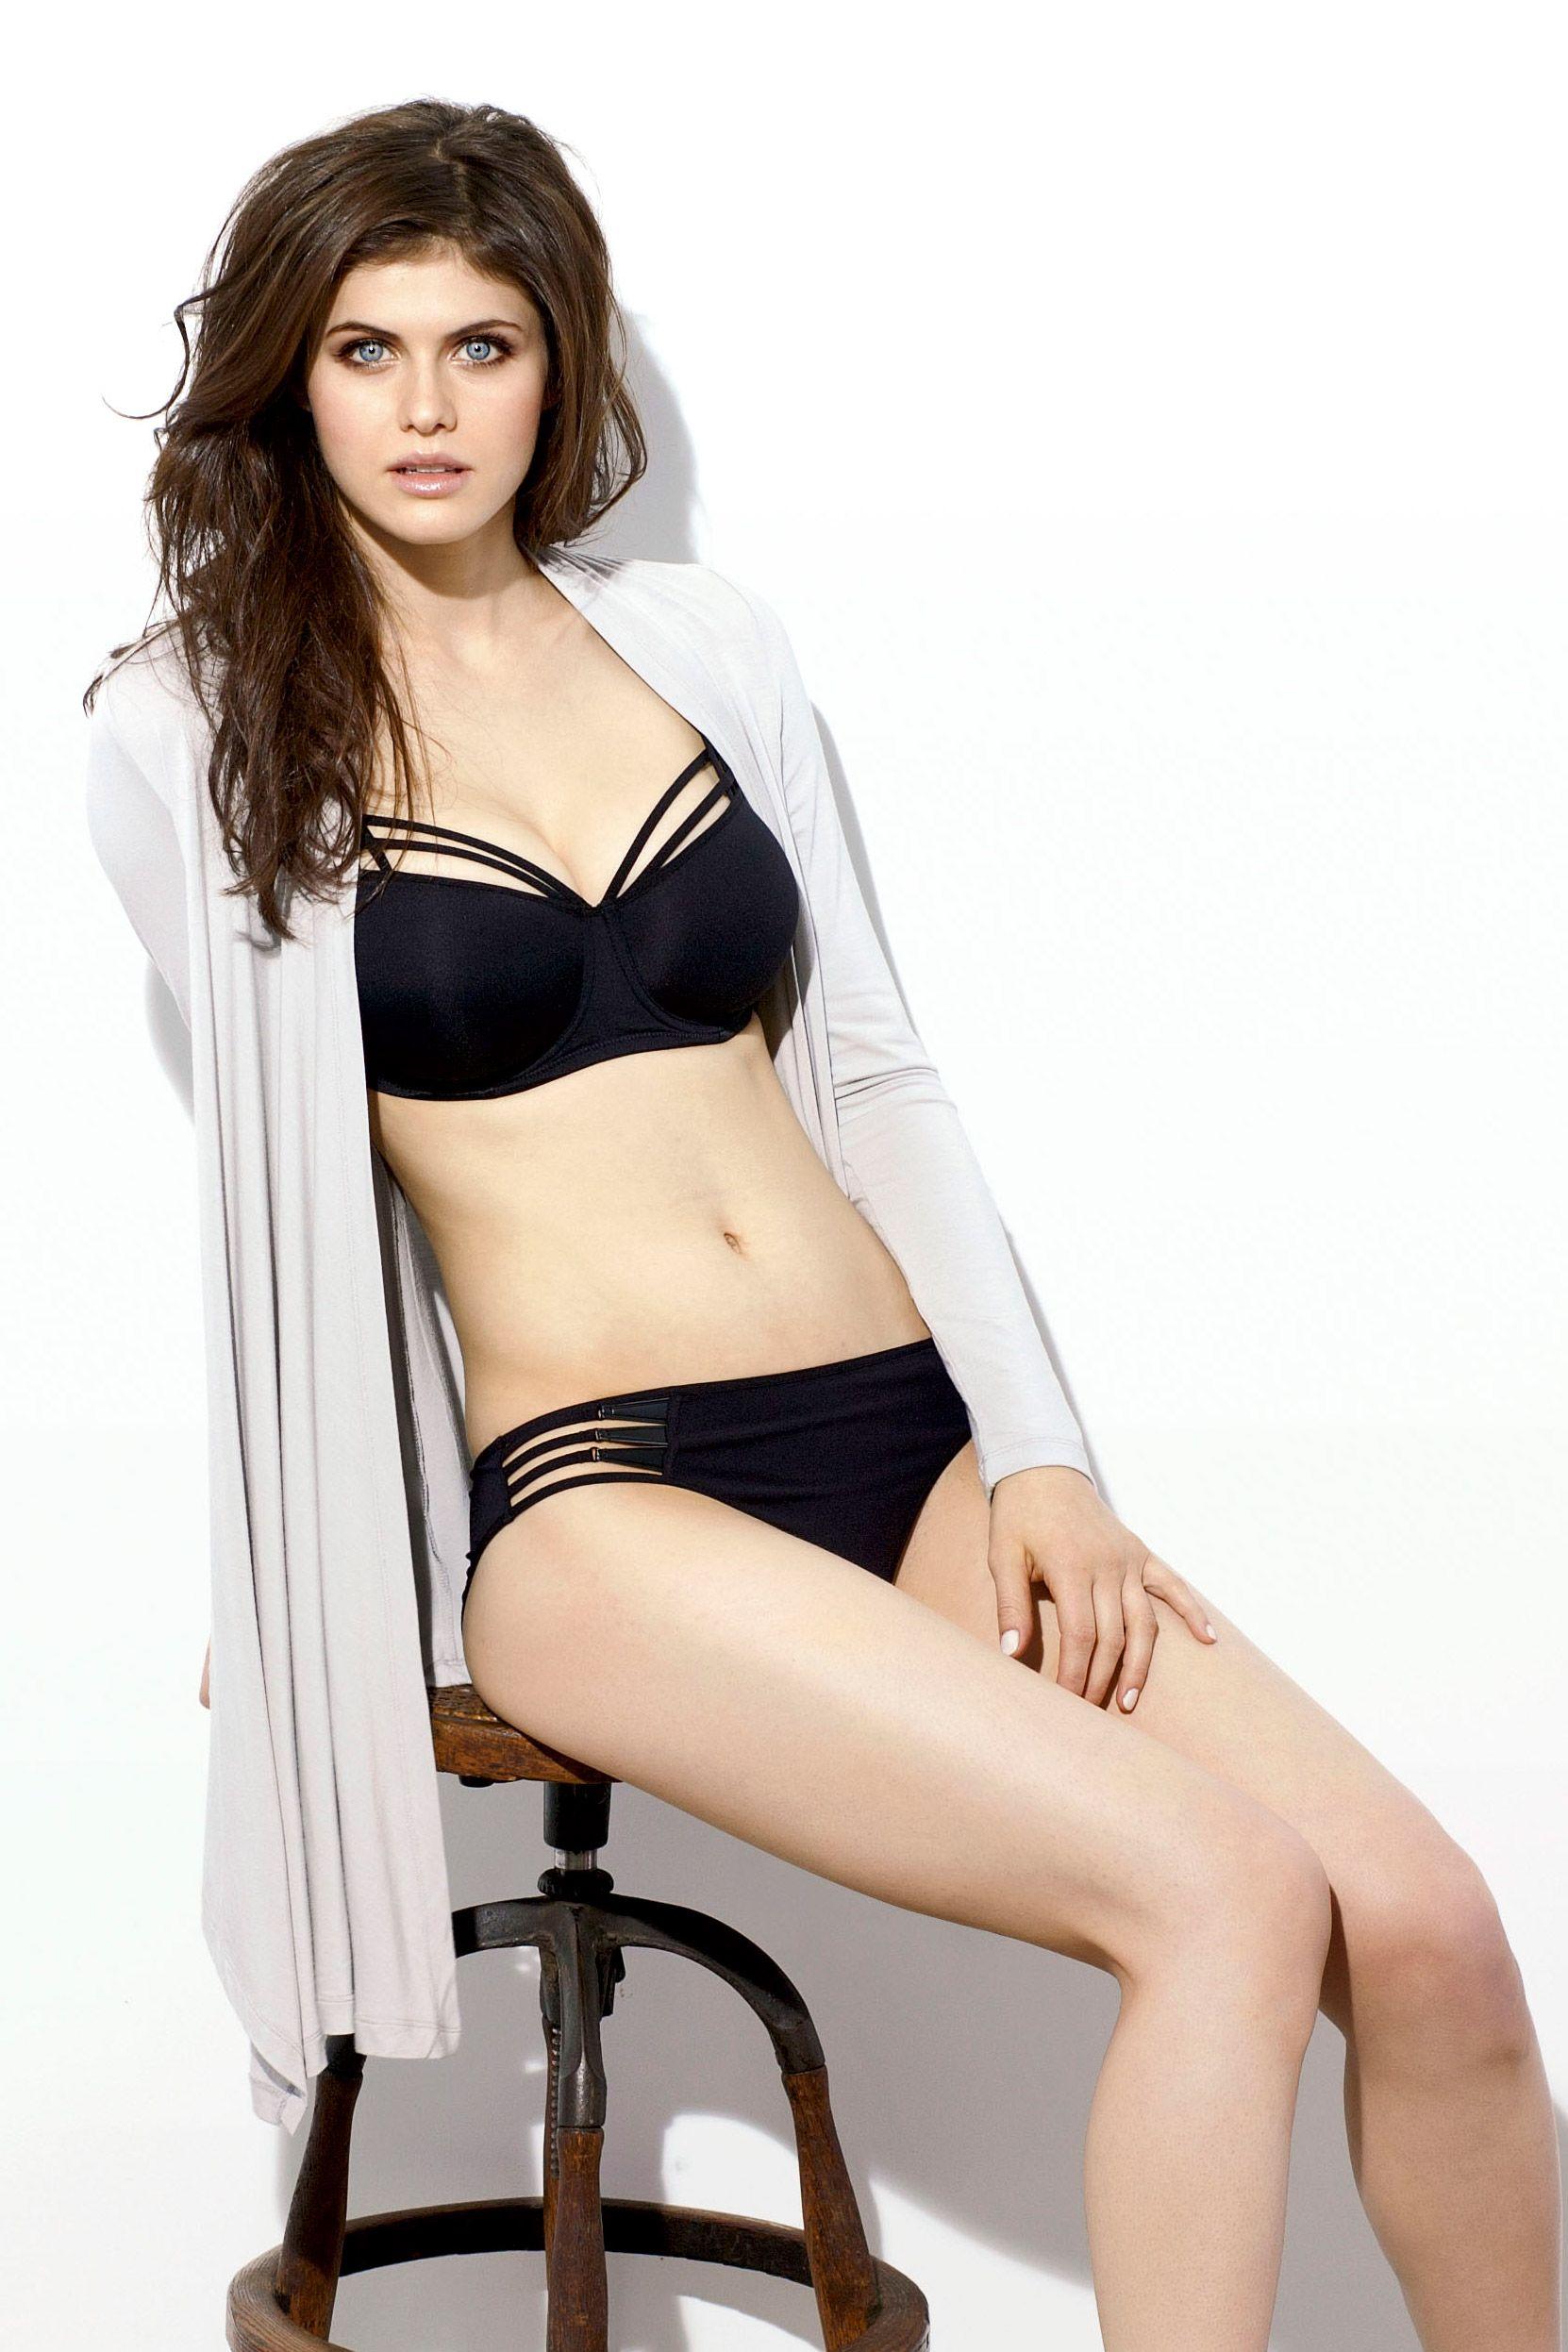 Hot Alexandra Daddario nudes (35 foto and video), Sexy, Leaked, Selfie, underwear 2017